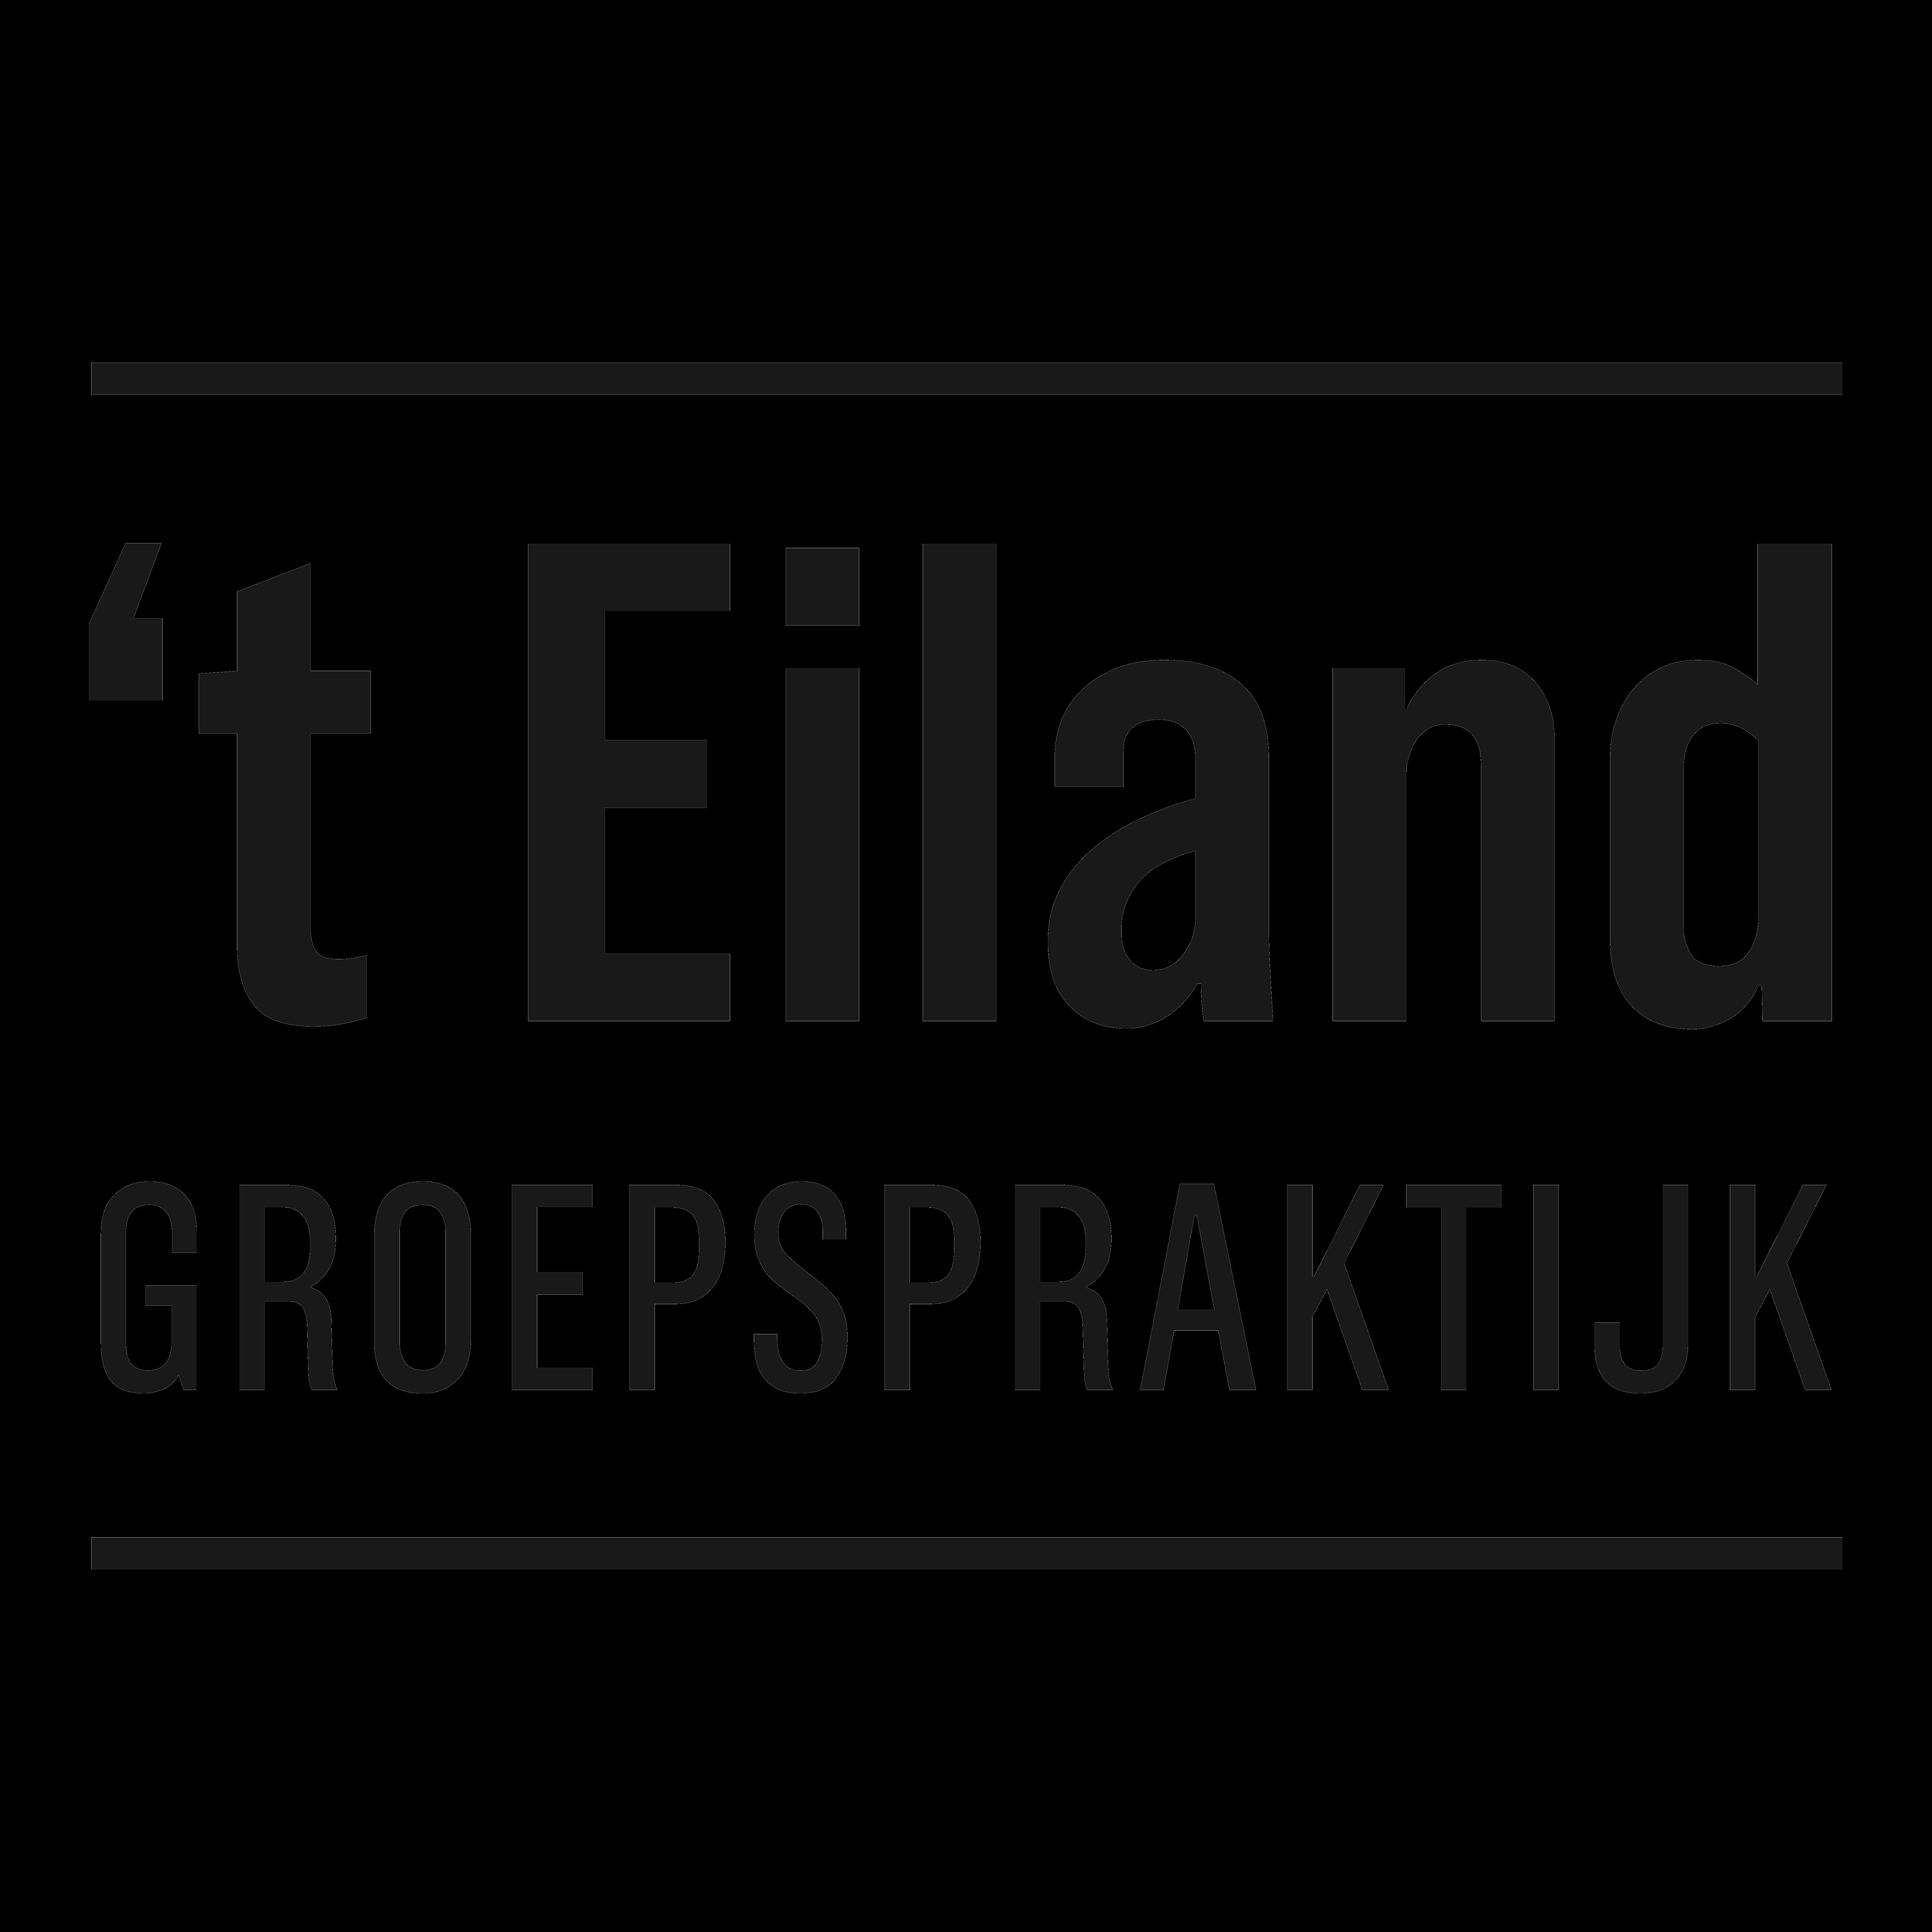 Groepspraktijk 't Eiland Harelbeke